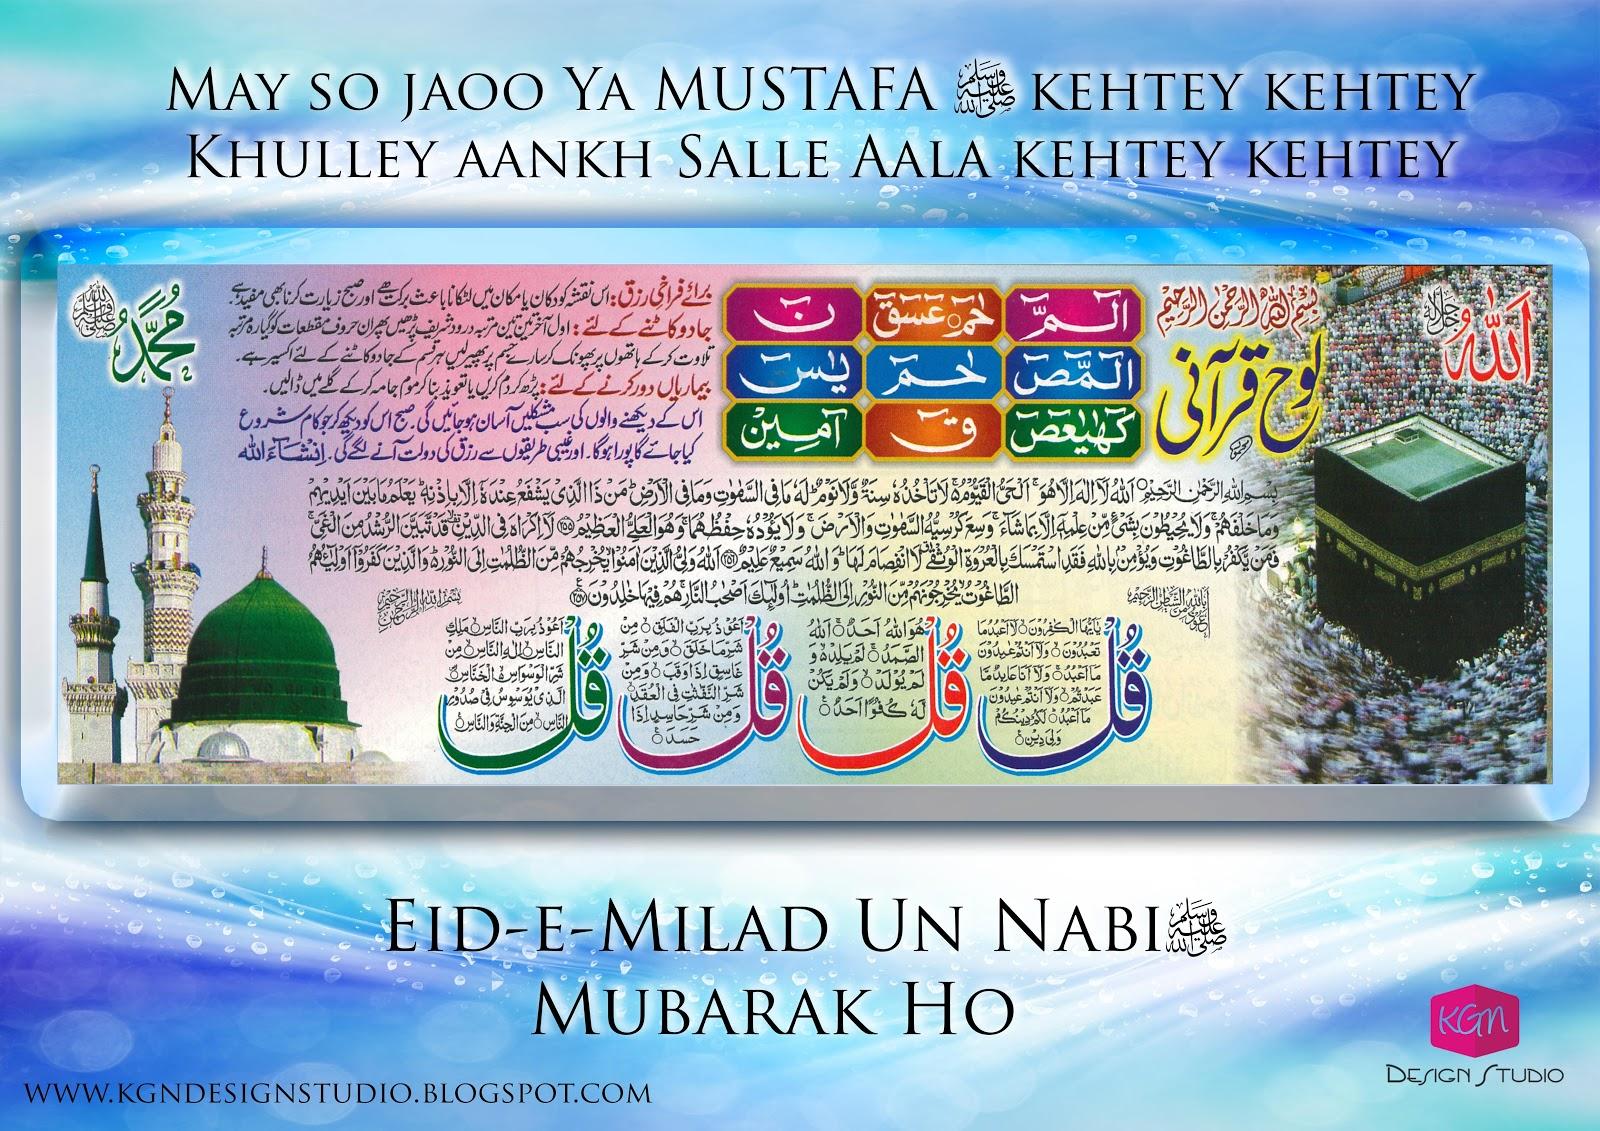 http://4.bp.blogspot.com/-M6E1ehvTyoU/UOayPYi7kEI/AAAAAAAACMM/JpzcKSvzy60/s1600/Eid-e-Milad-Wallpaper-12.jpg